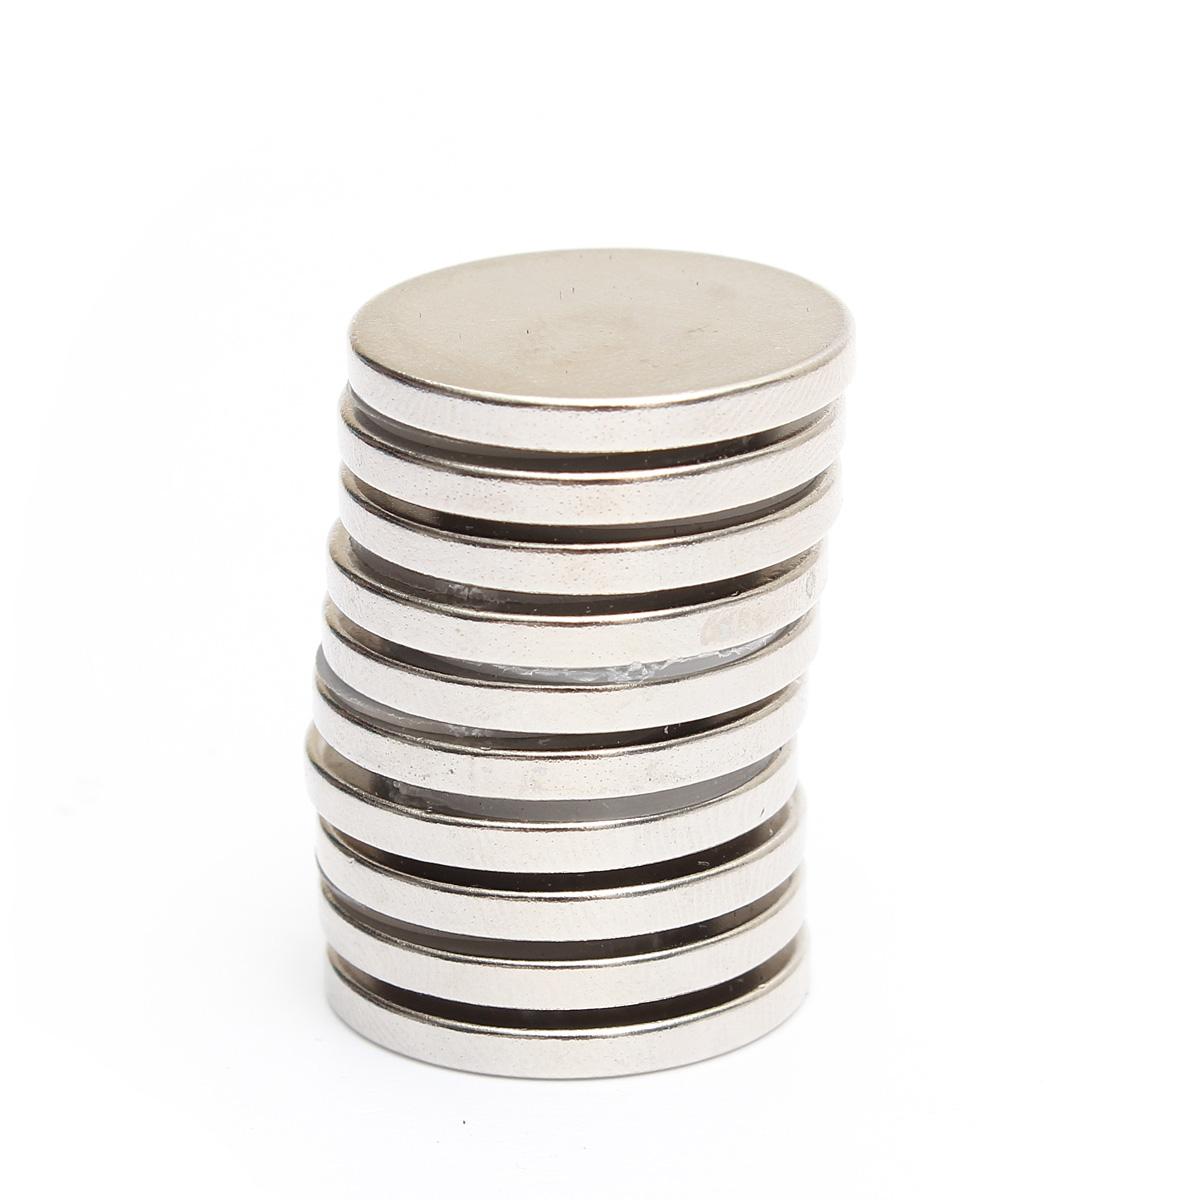 Buy 10pcs N52 25mmx3mm Round Neodymium Magnets Rare Earth